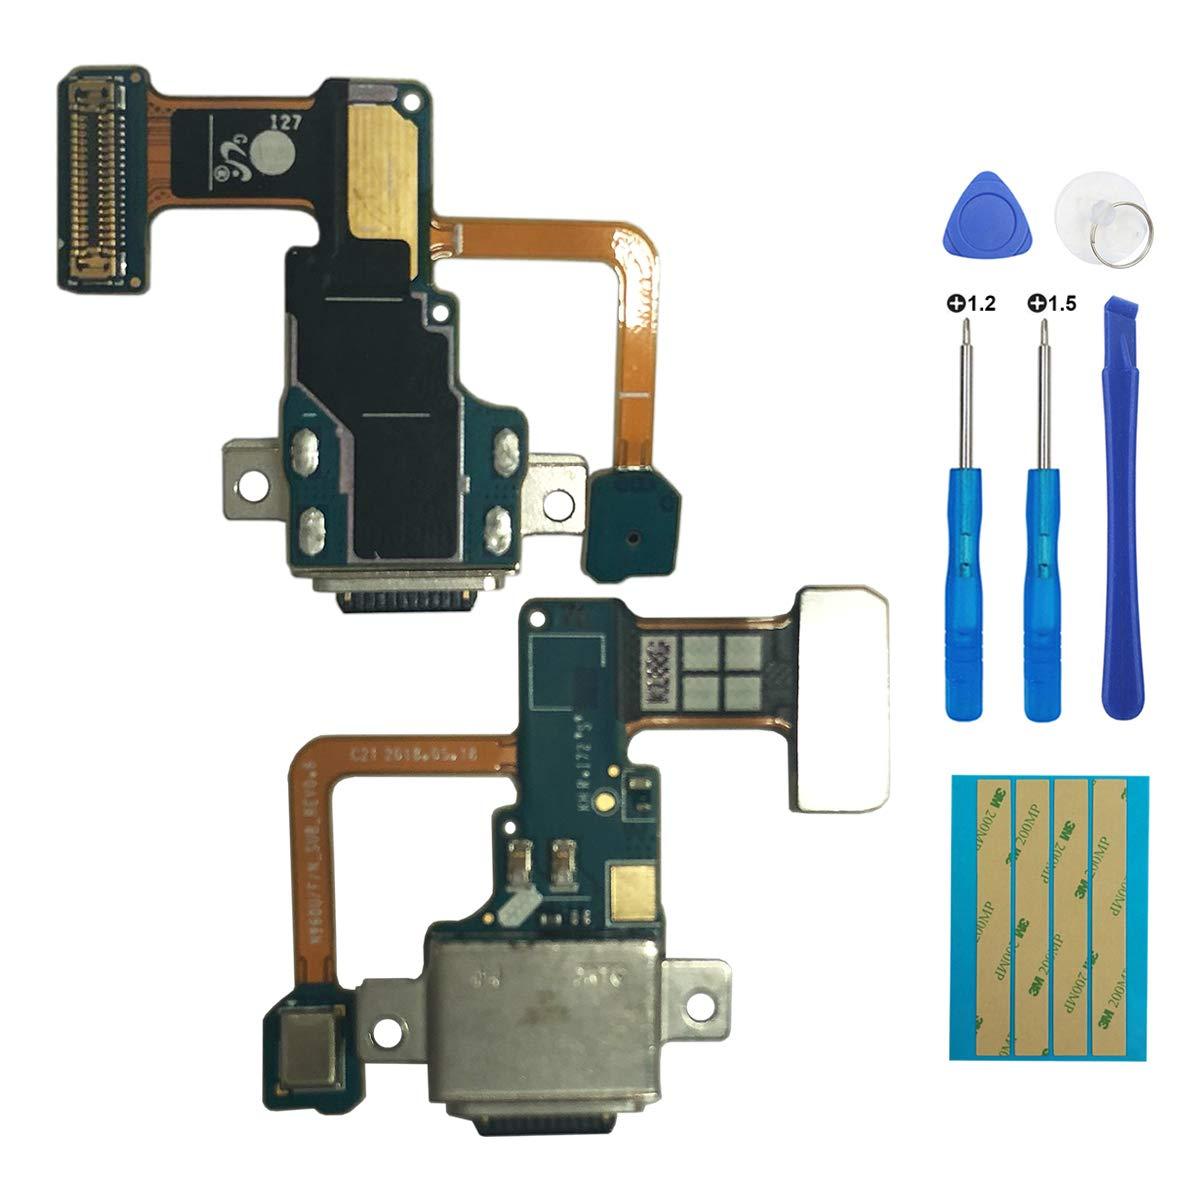 Puerto de Carga para Samsung Note9 N960U Charger MIC Dock Fl